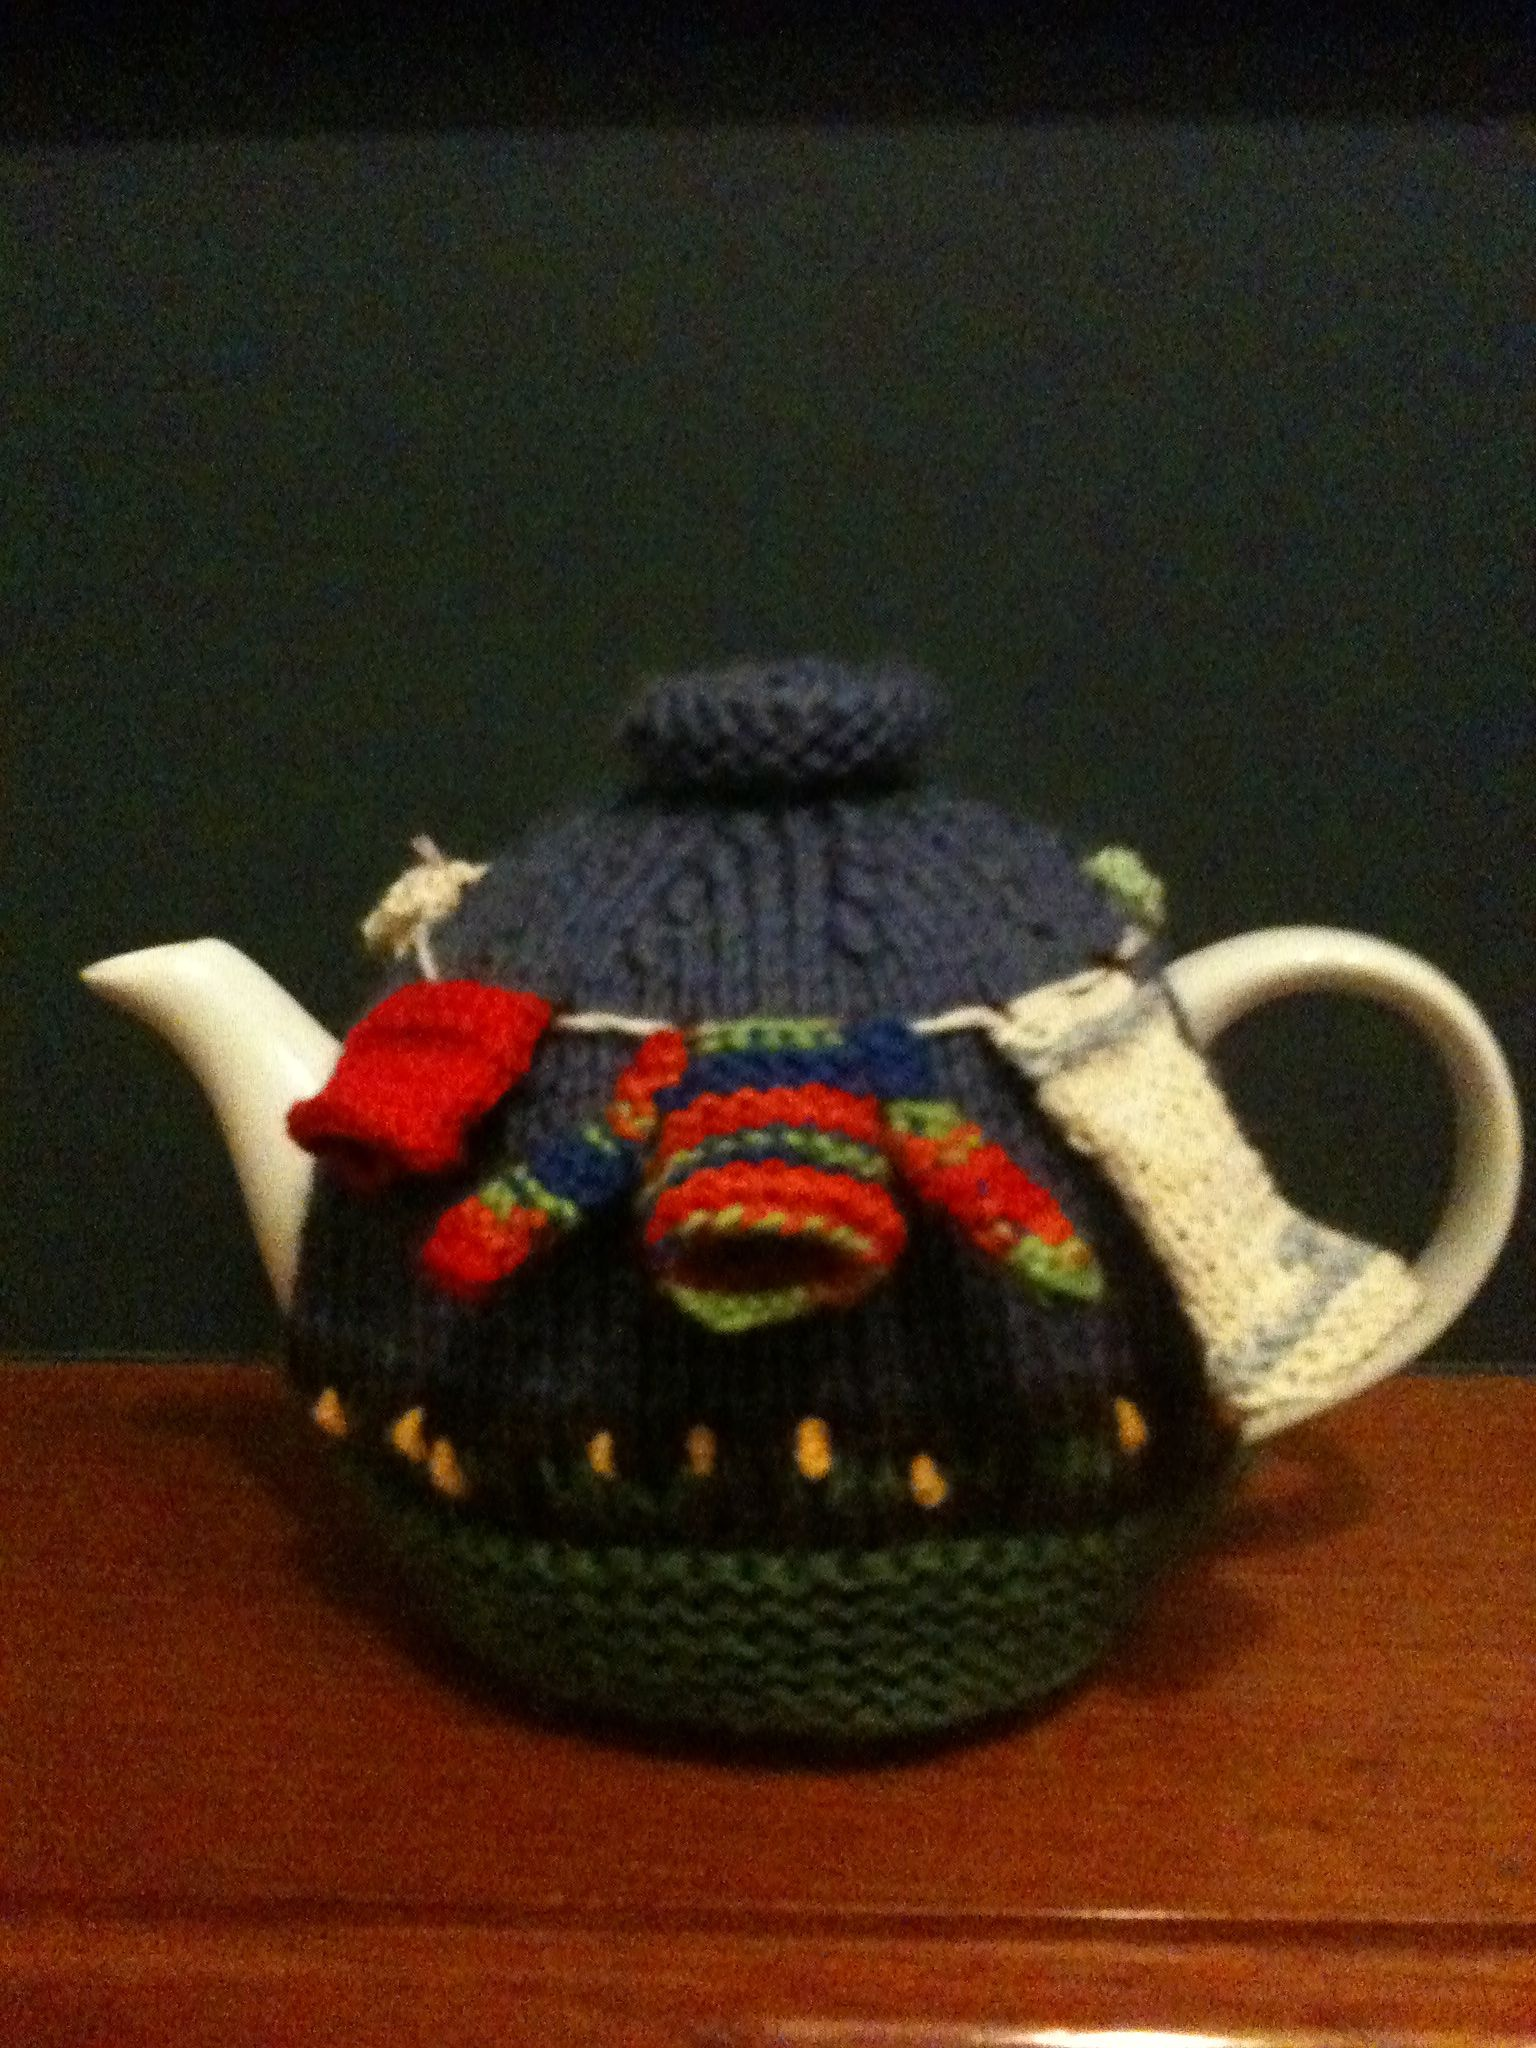 Washing day tea cosy knittingthings pinterest teas washing day tea cosy bankloansurffo Choice Image